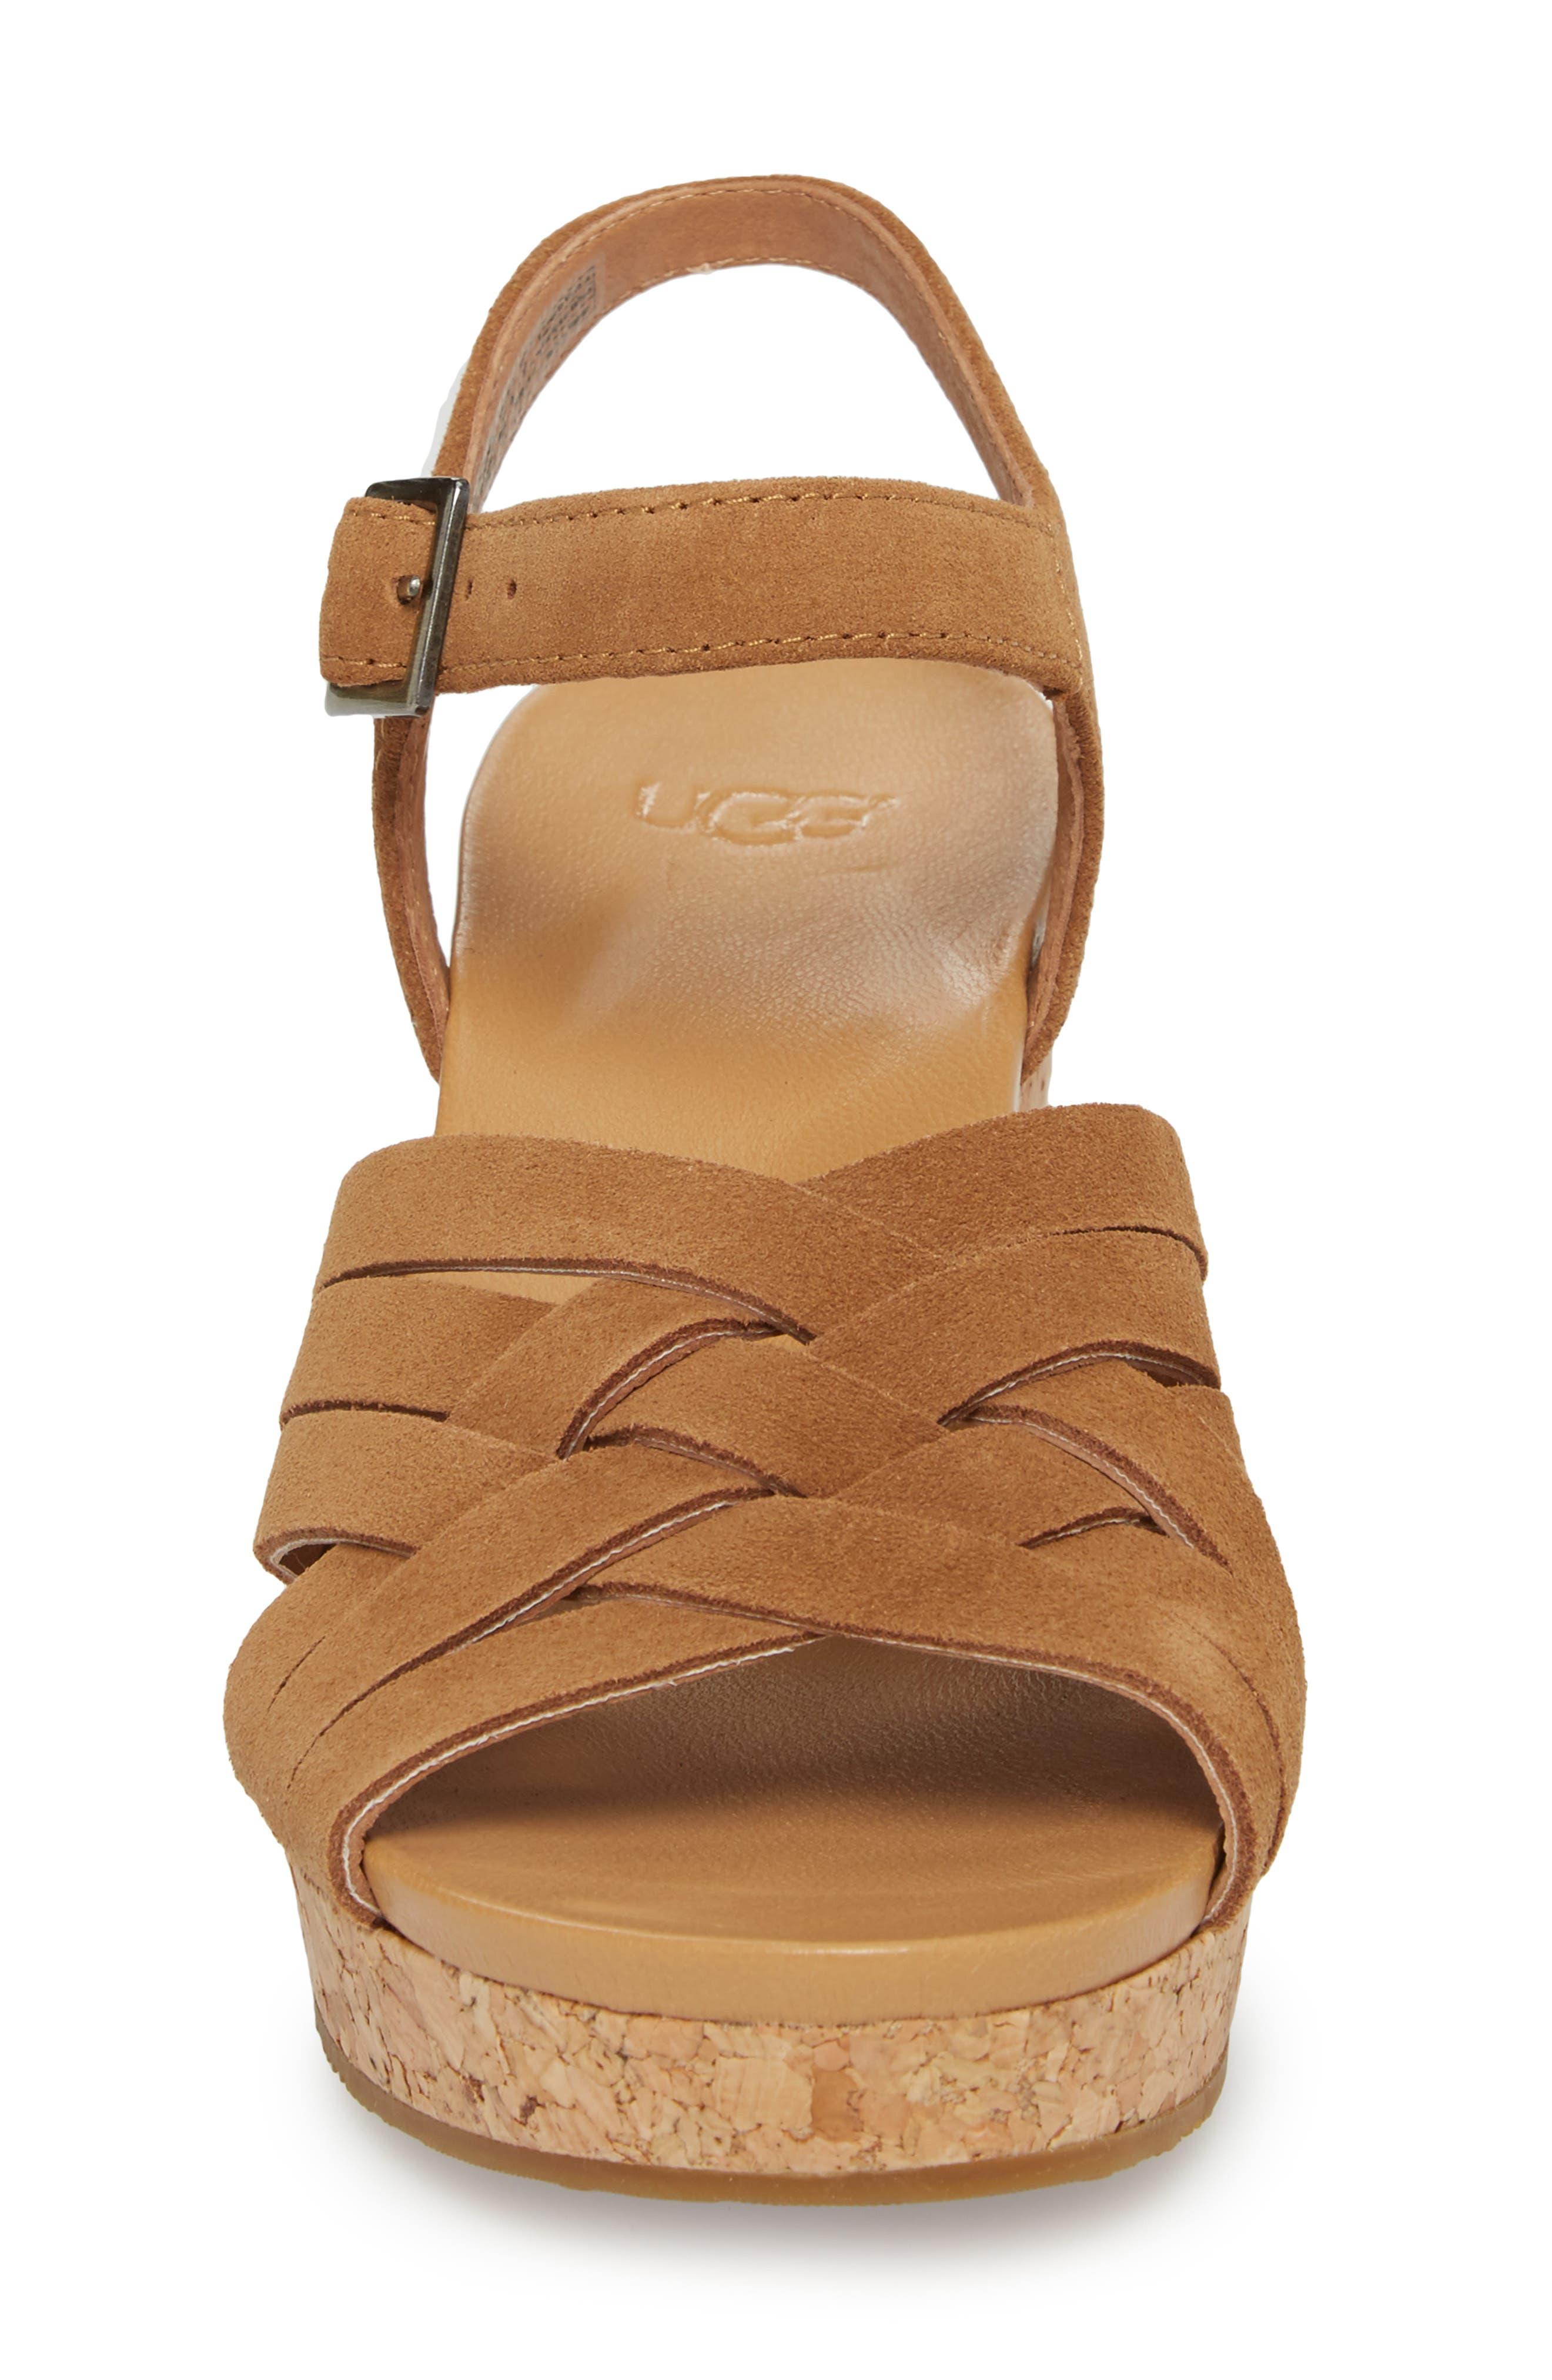 Uma Wedge Sandal,                             Alternate thumbnail 4, color,                             Chestnut Suede